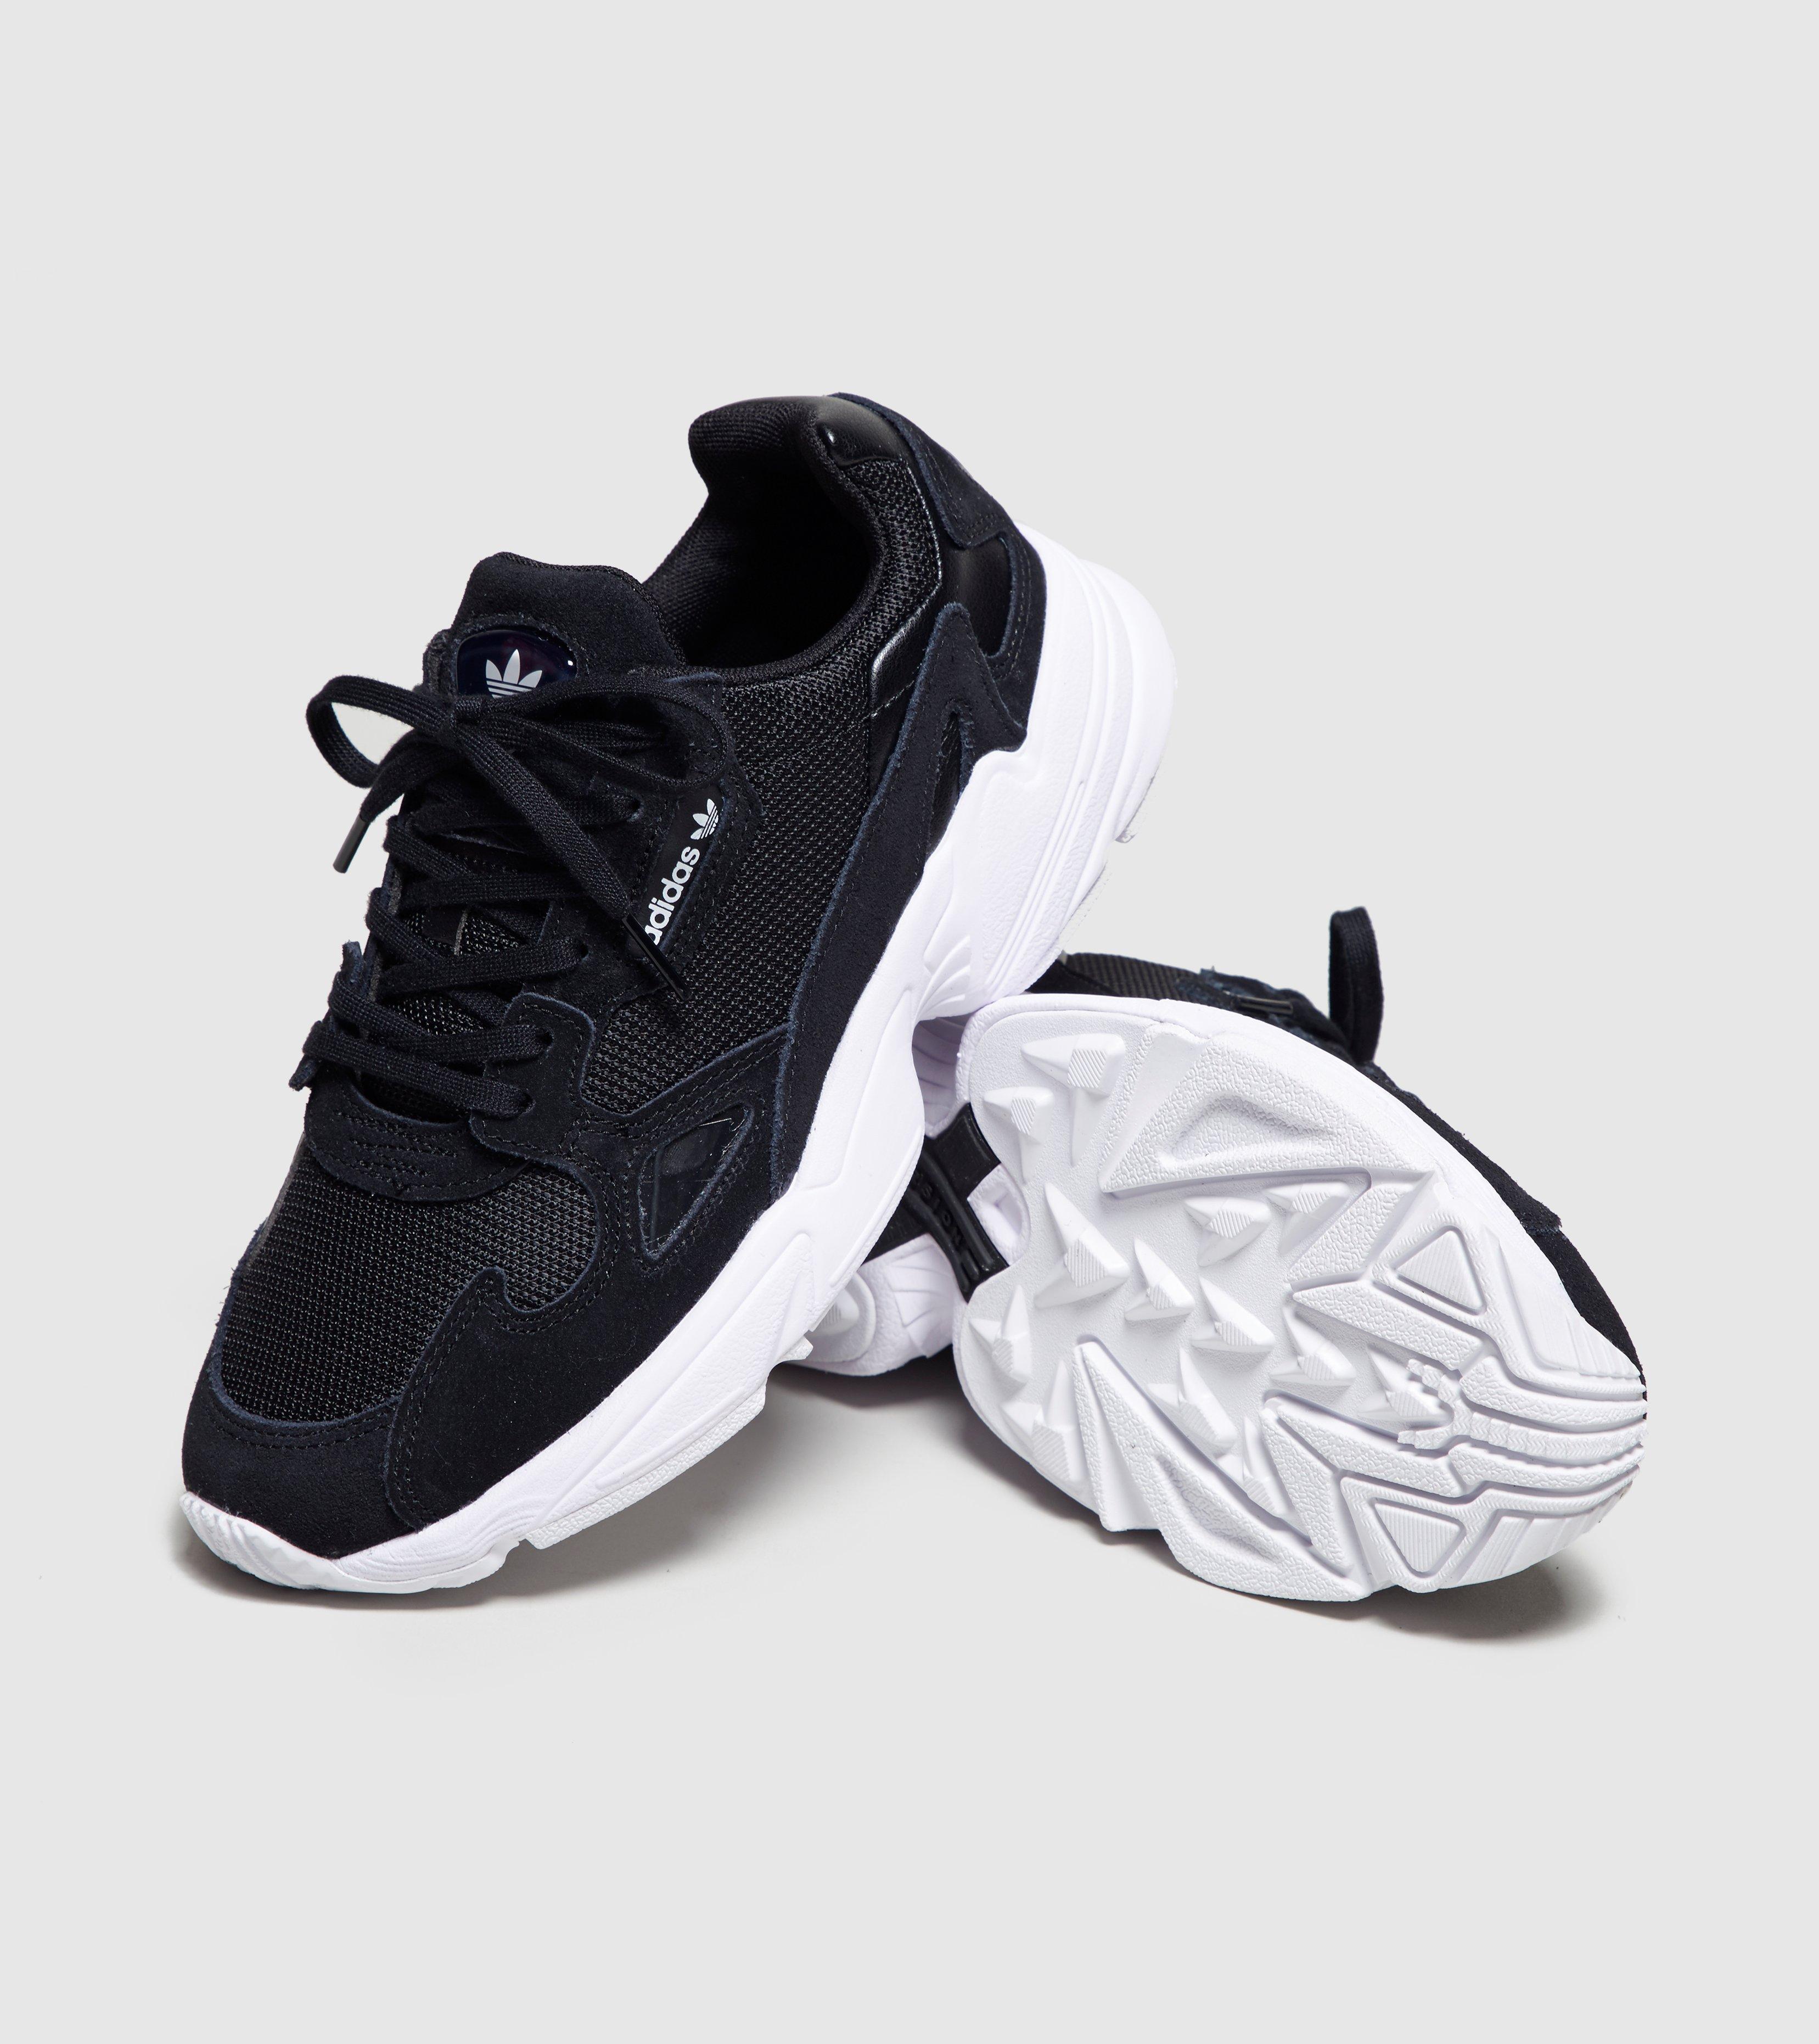 Adidas Originals Black Falcon Women's